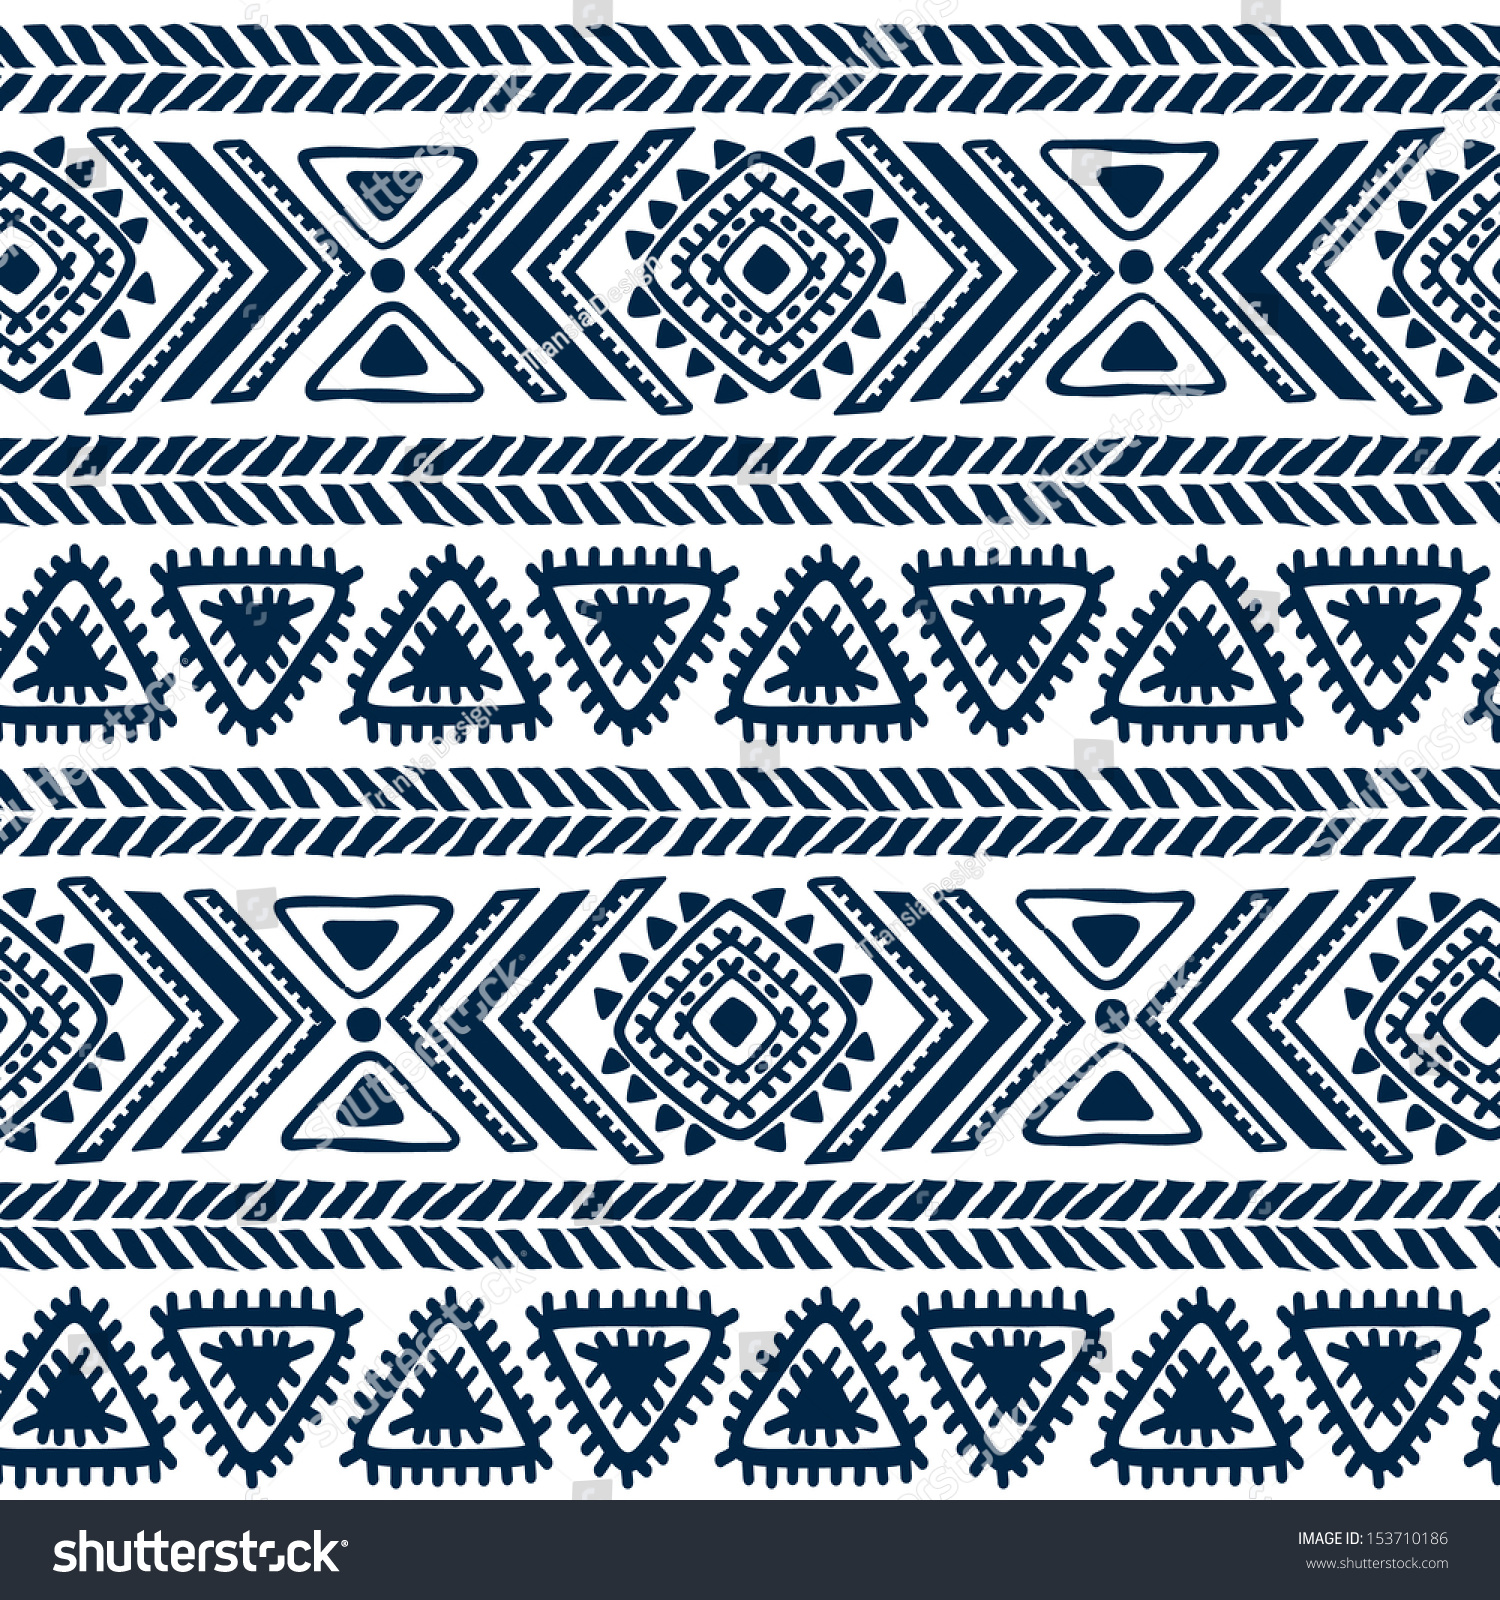 100 Colorful Tribal Vintage Ethnic Seamless Tribal  : stock vector tribal vintage ethnic seamless 153710186 from ubytovani-melnik.com size 1500 x 1600 jpeg 1463kB